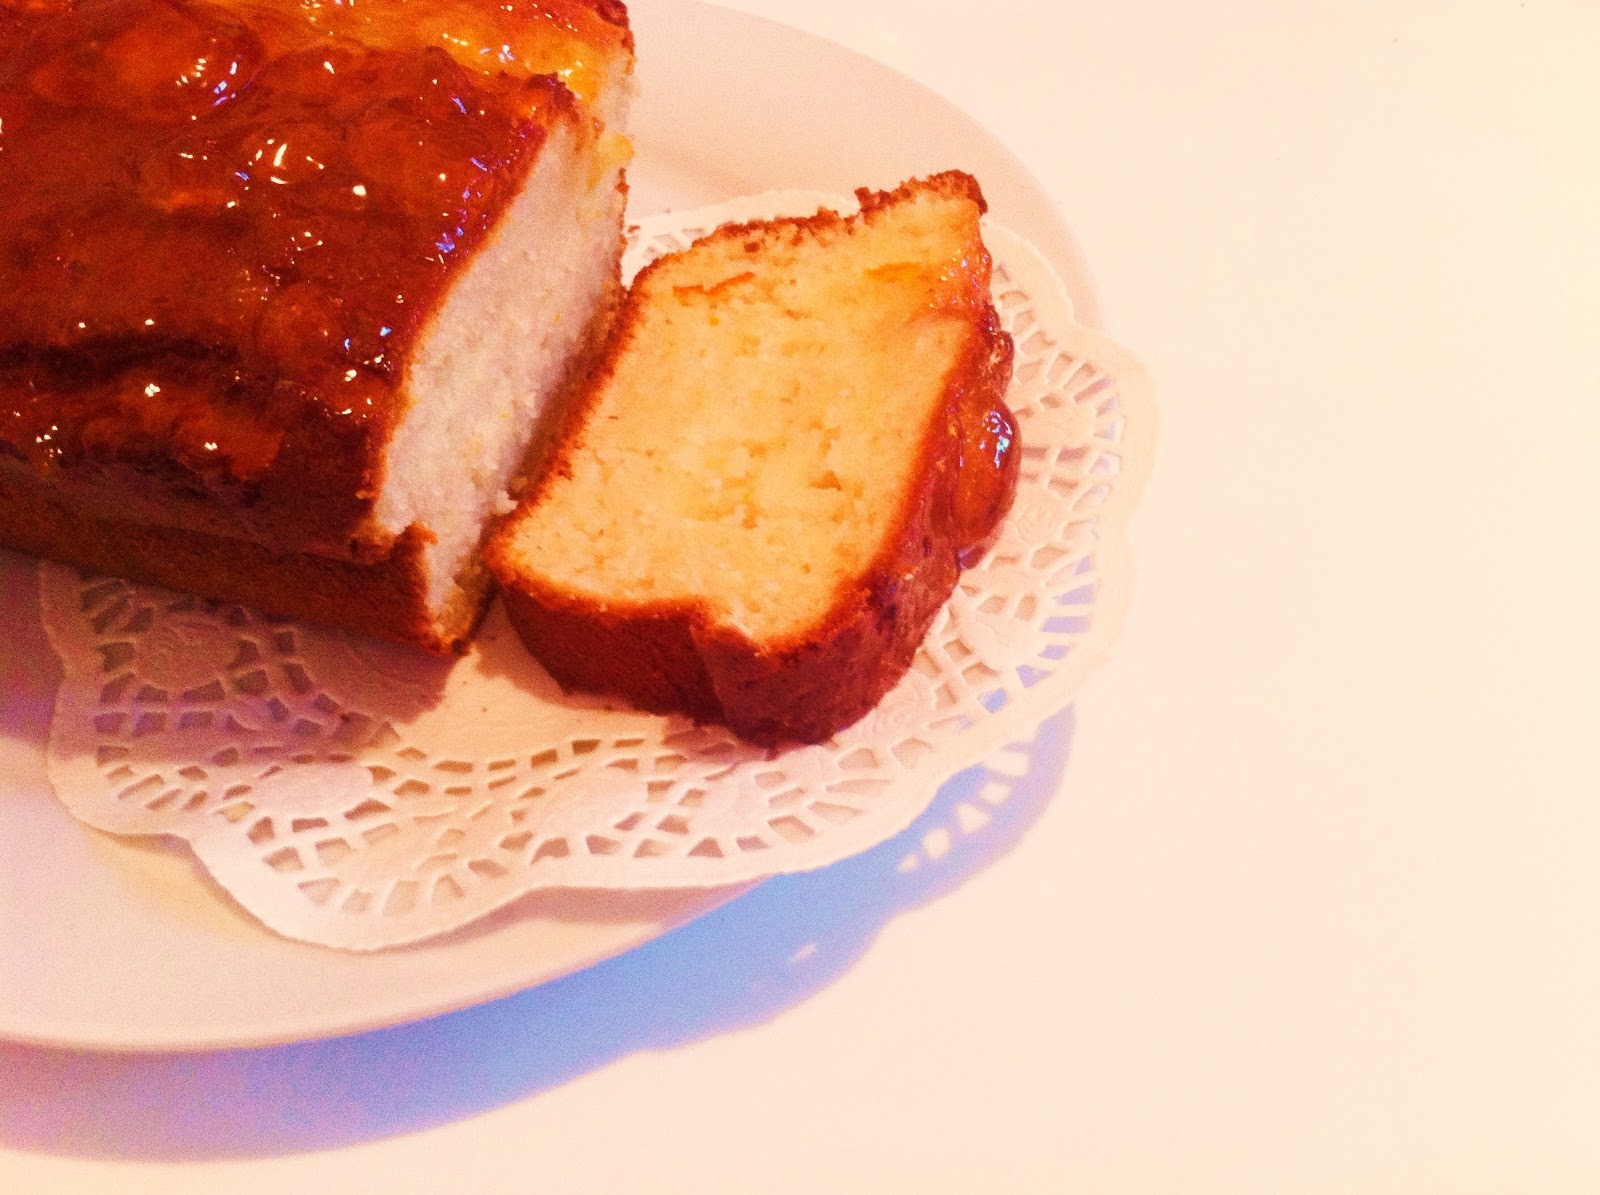 Marmalade Loaf Cake Recipes: My Gourmet Bites.: Yoghurt & Marmalade Loaf Cake